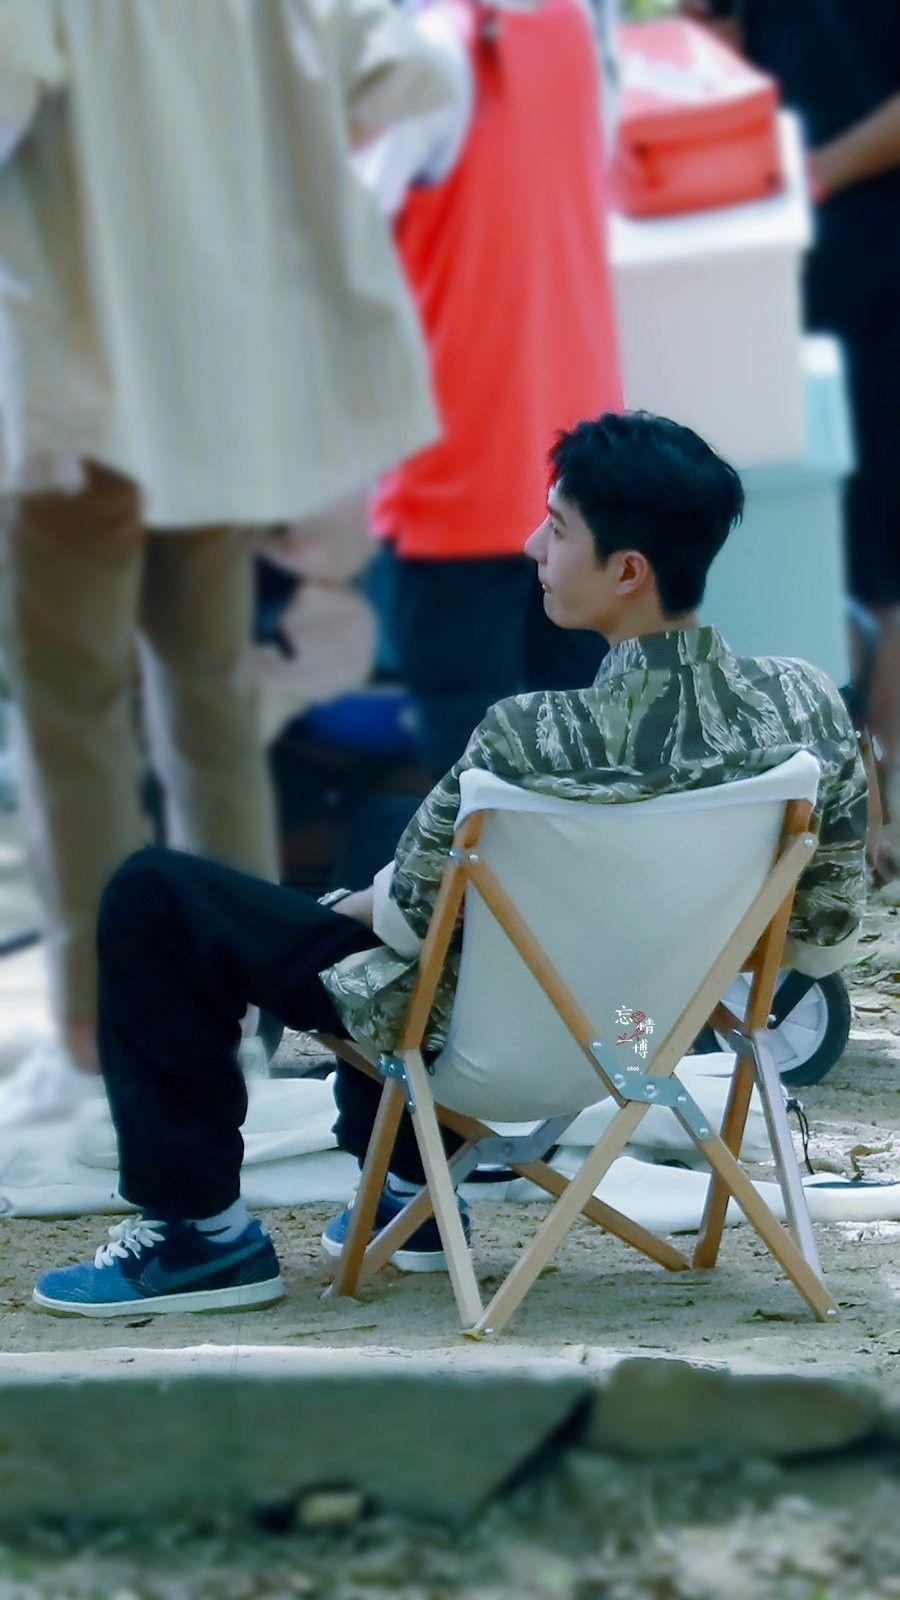 wangyibo 王一博 in 2020 Baby strollers, Stroller, My sunshine